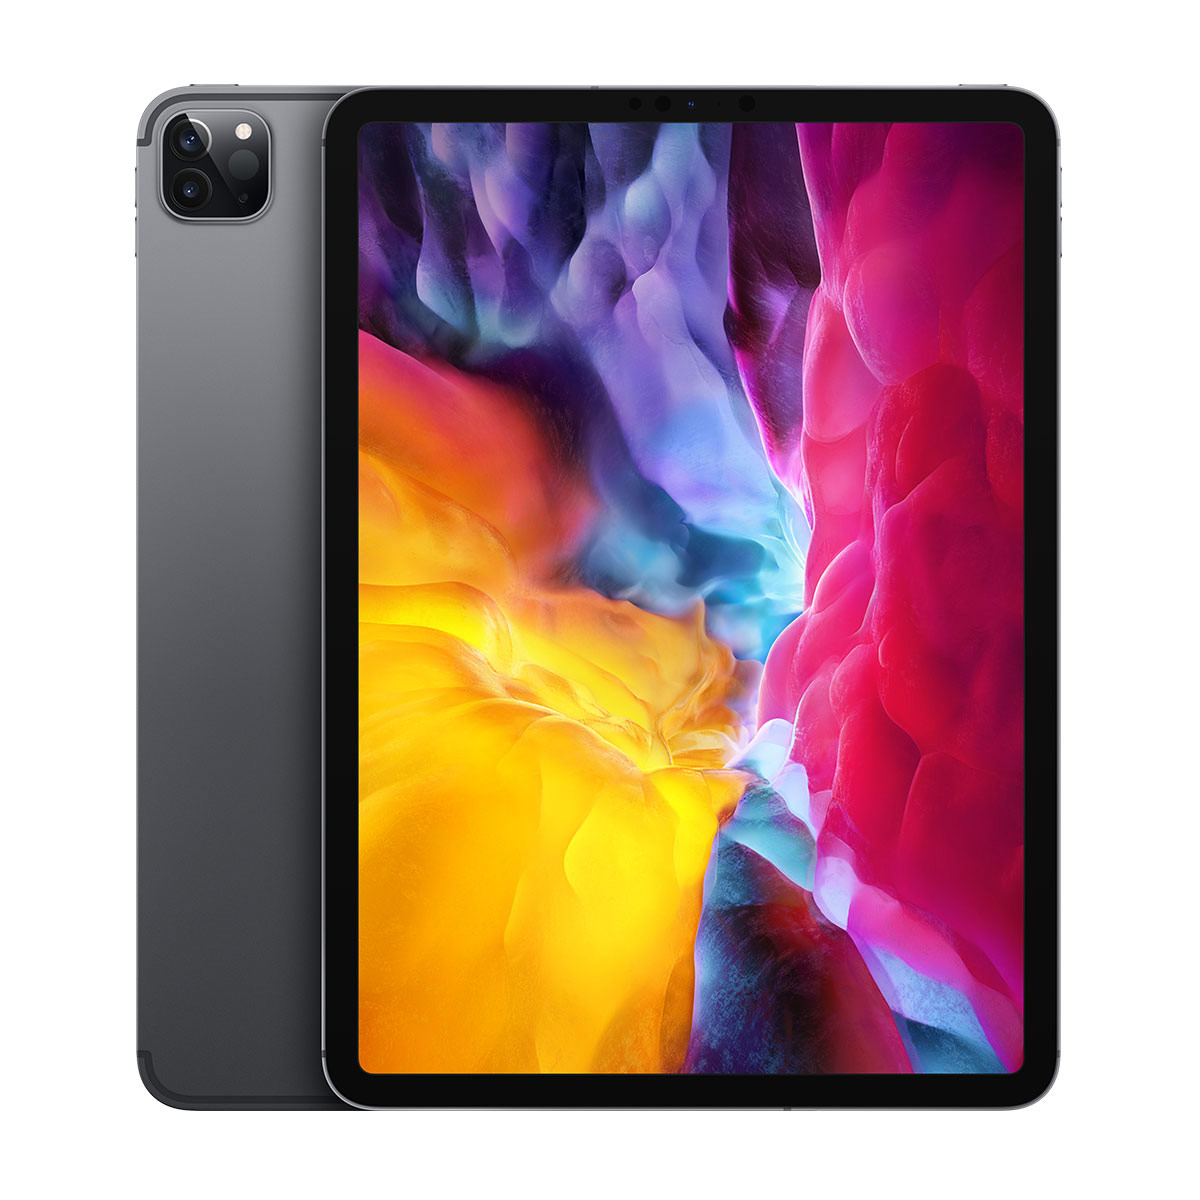 "Apple iPad Pro 11"" 256GB WiFi + Cellular - Space Grey"